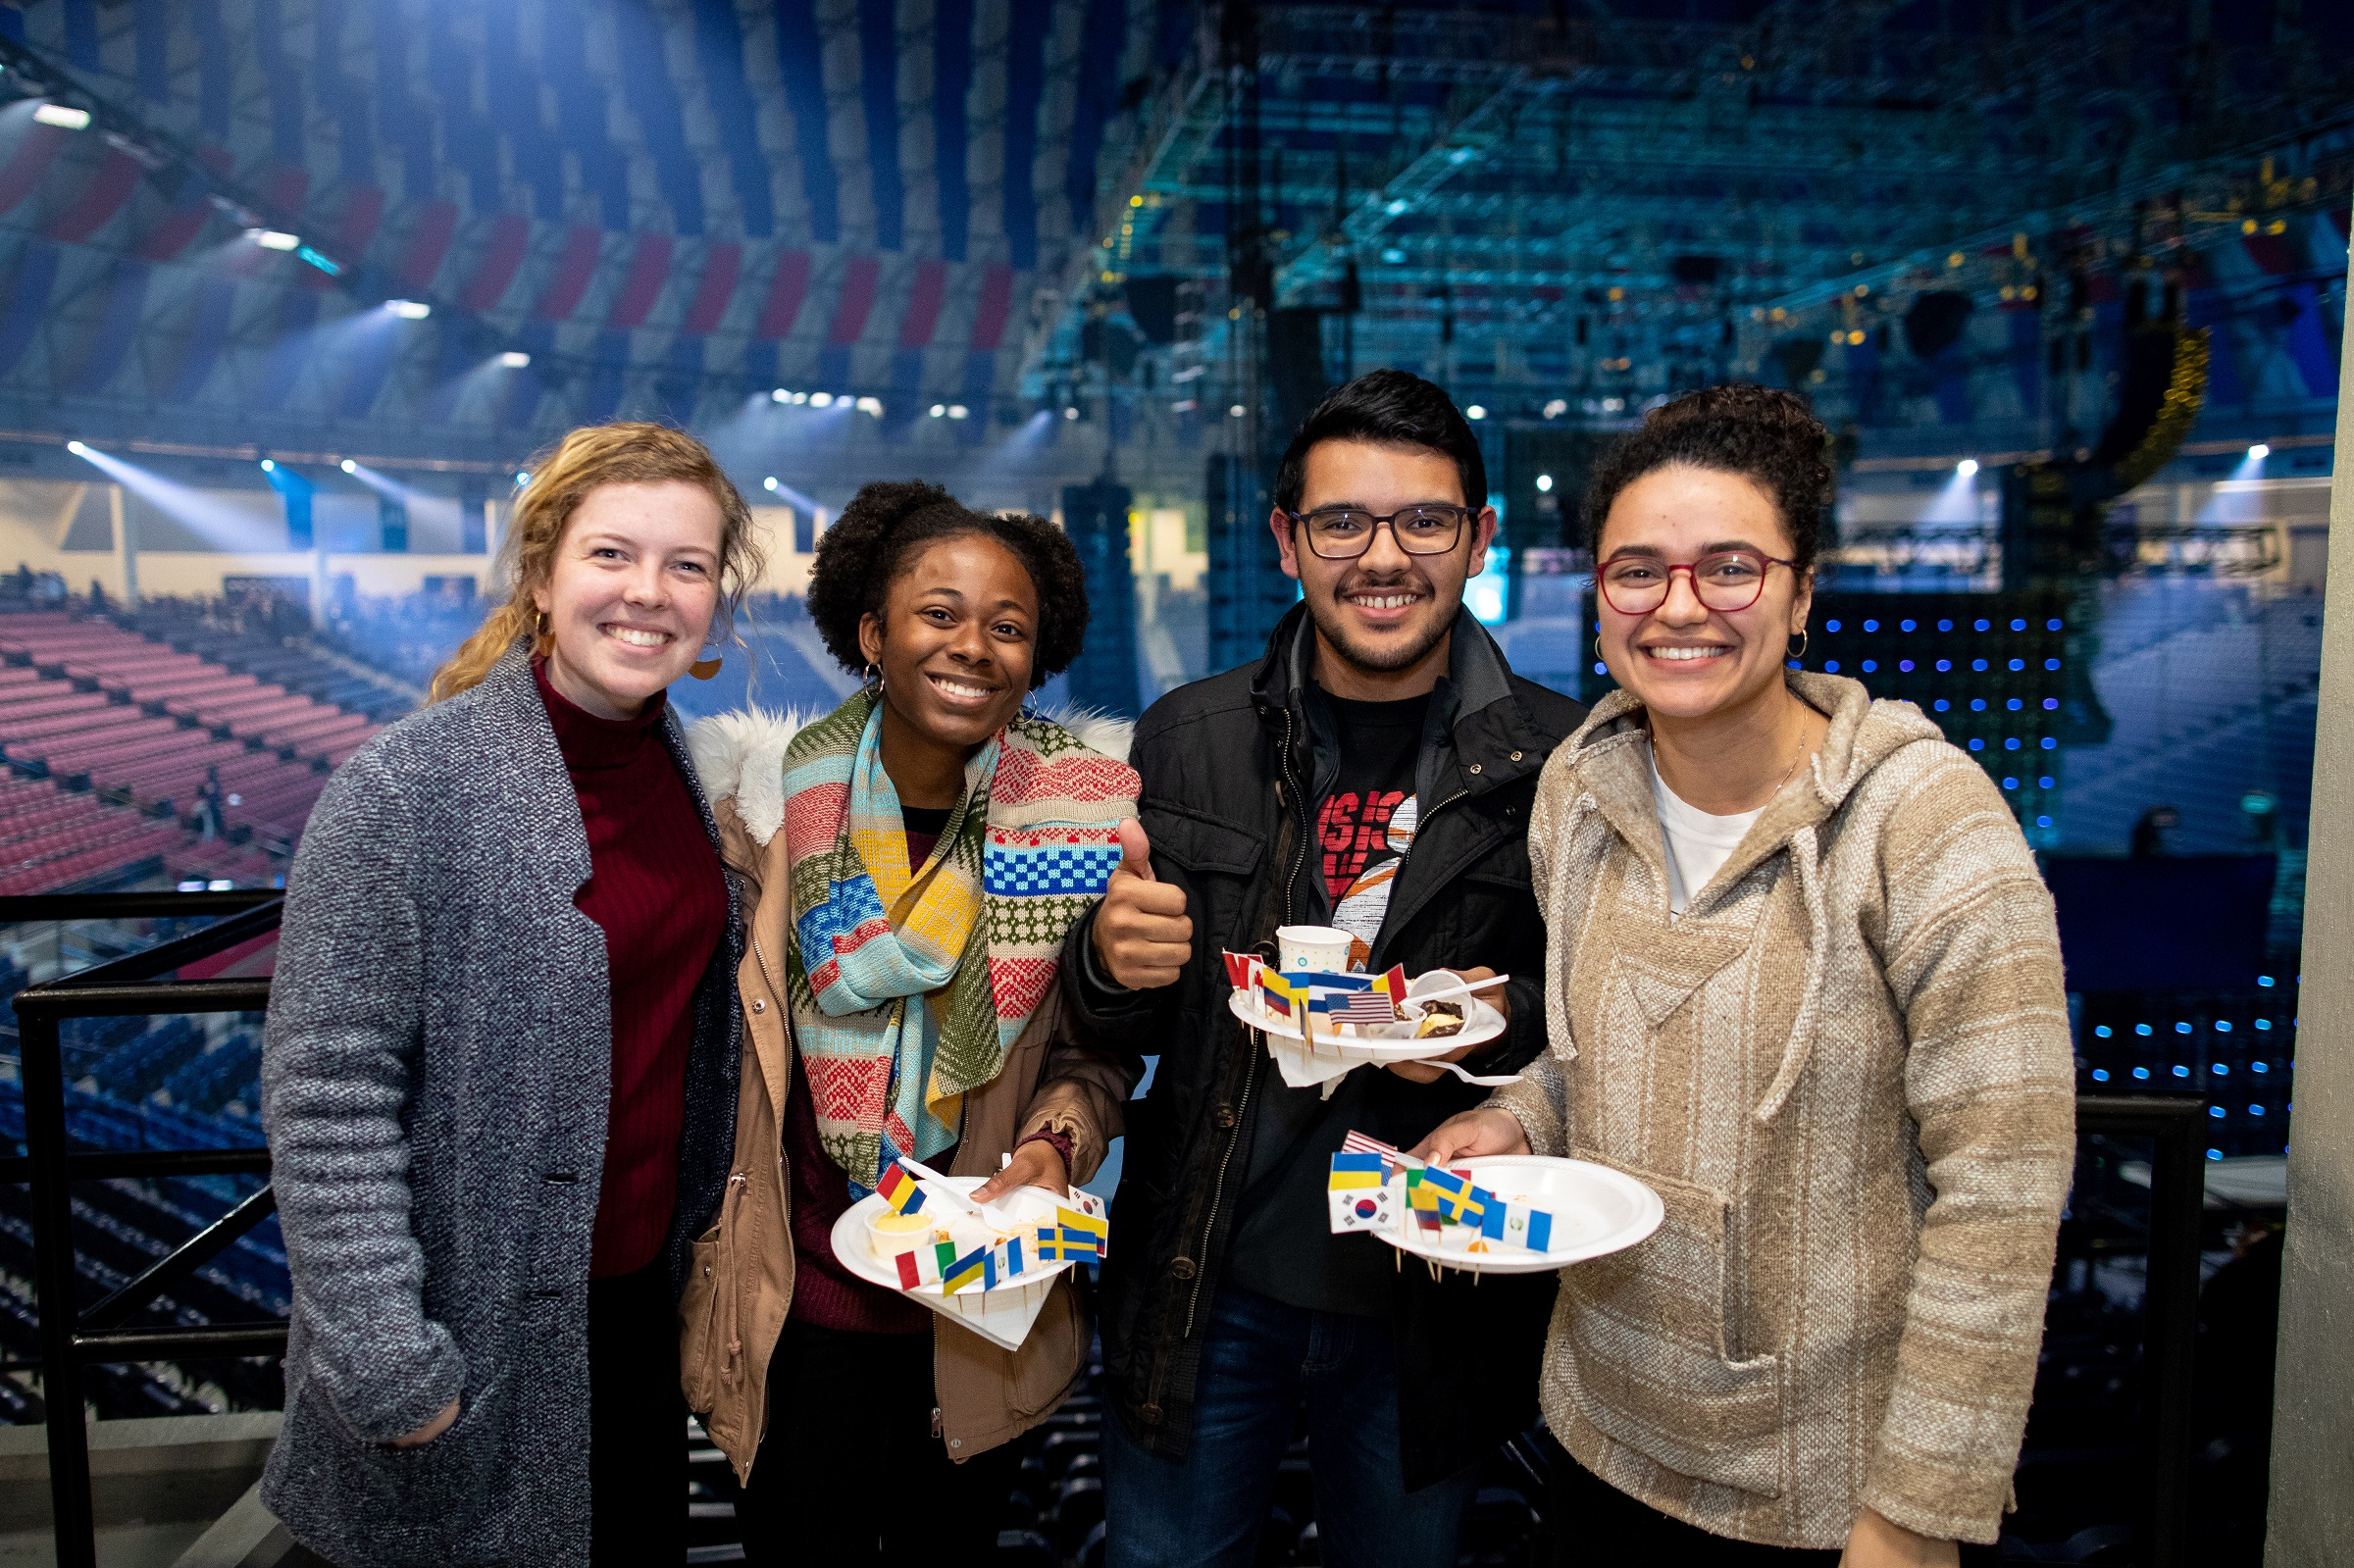 Liberty University International Students